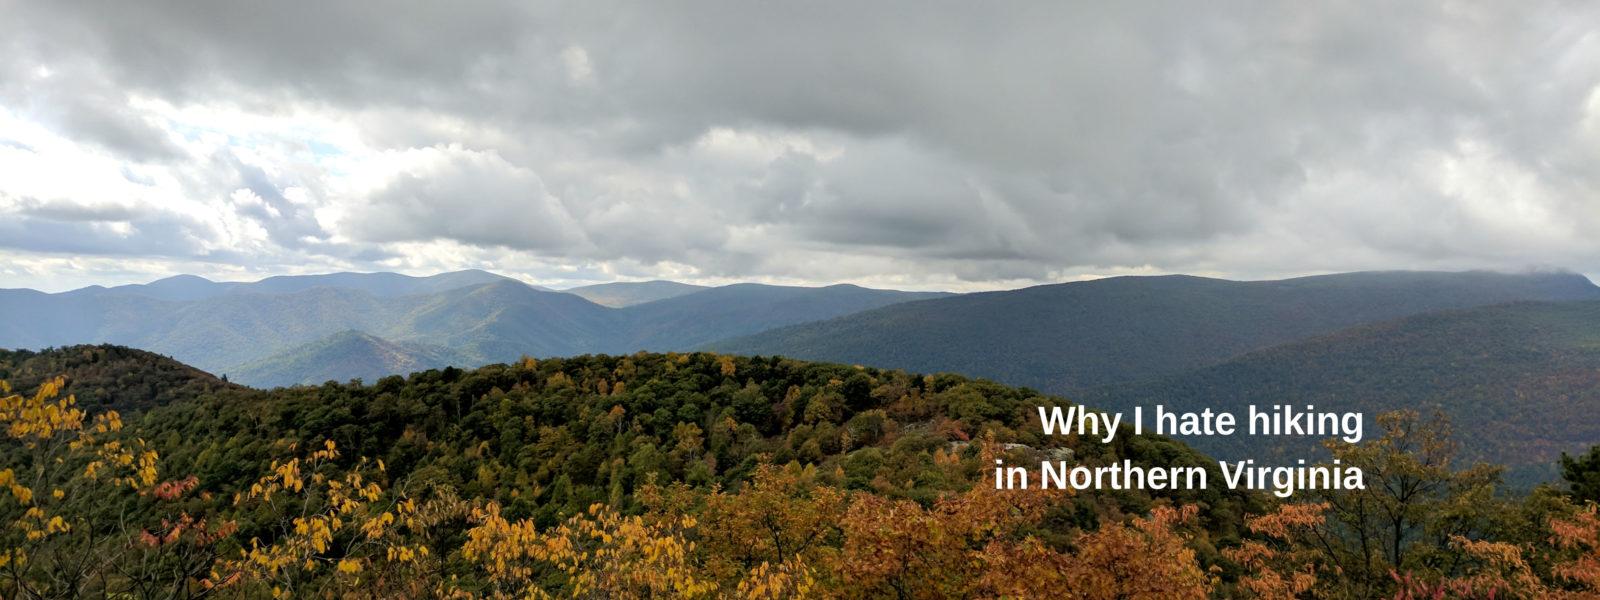 Why I Hate Hiking in Northern Virginia